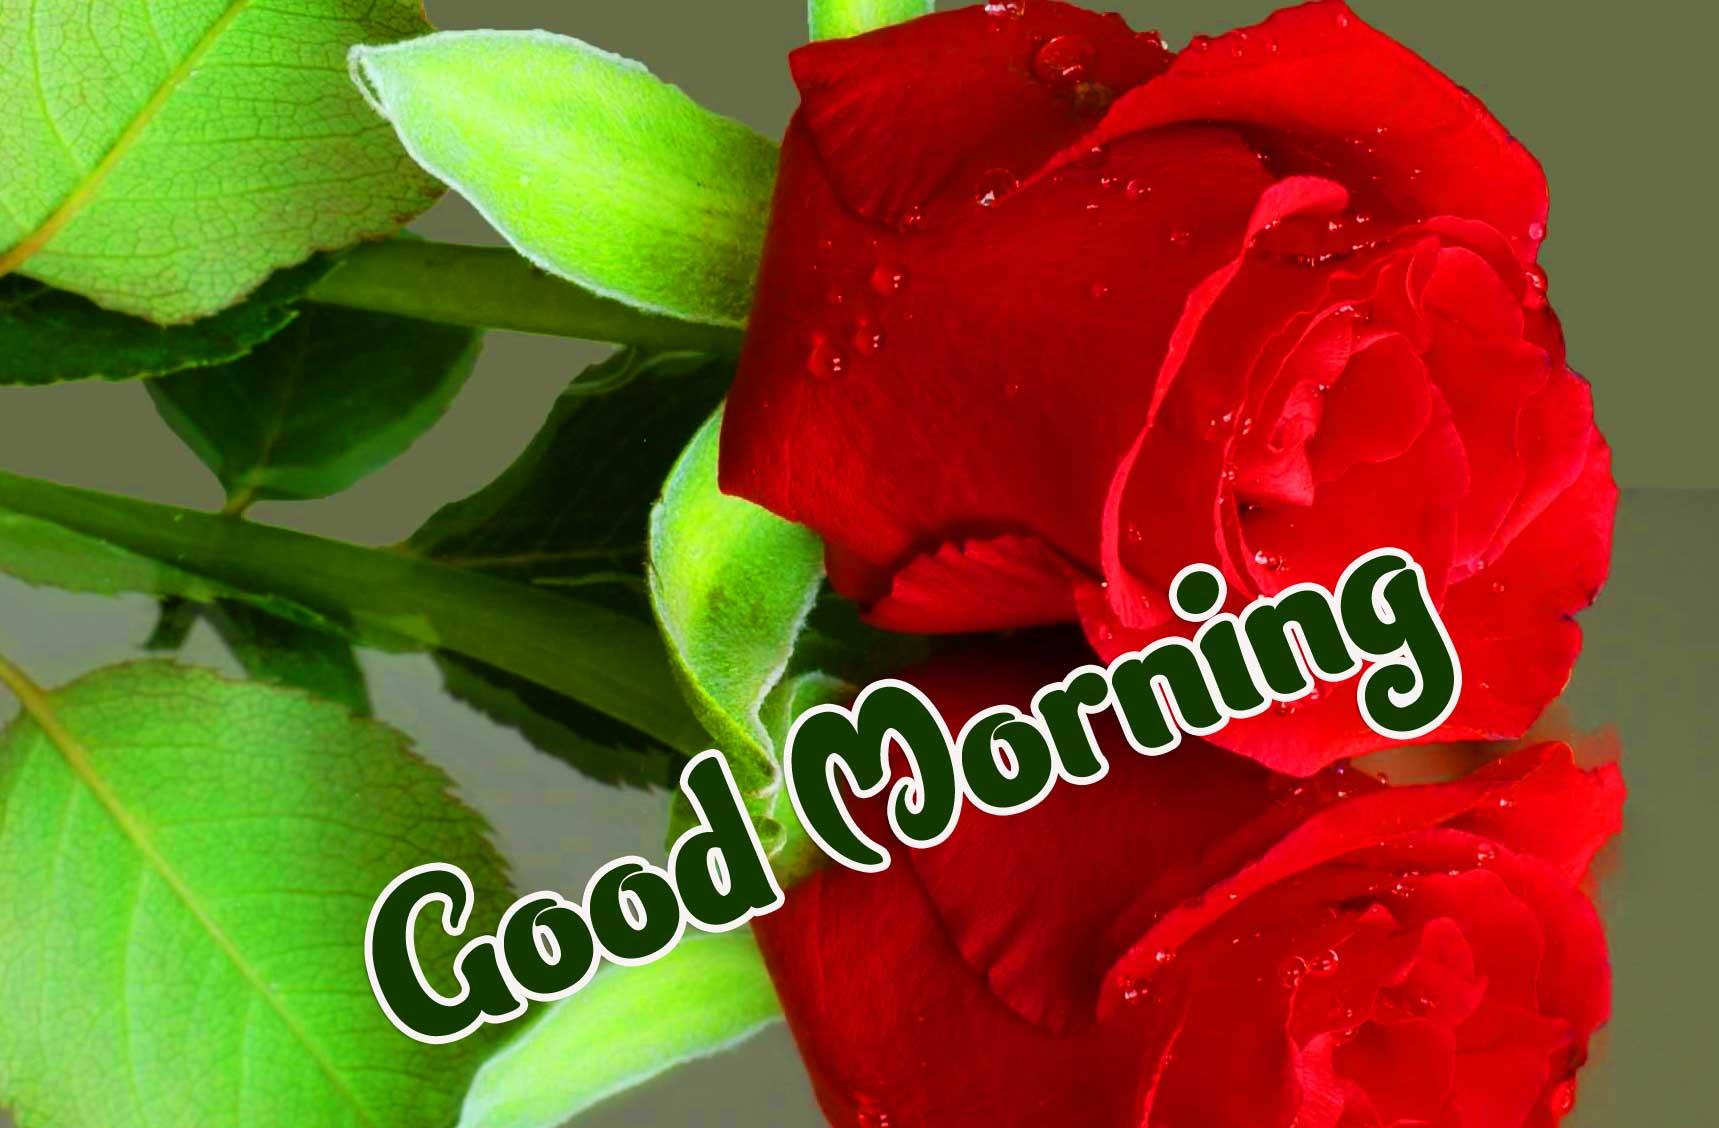 Red Rose Good Morning Wallpaper Pics Download